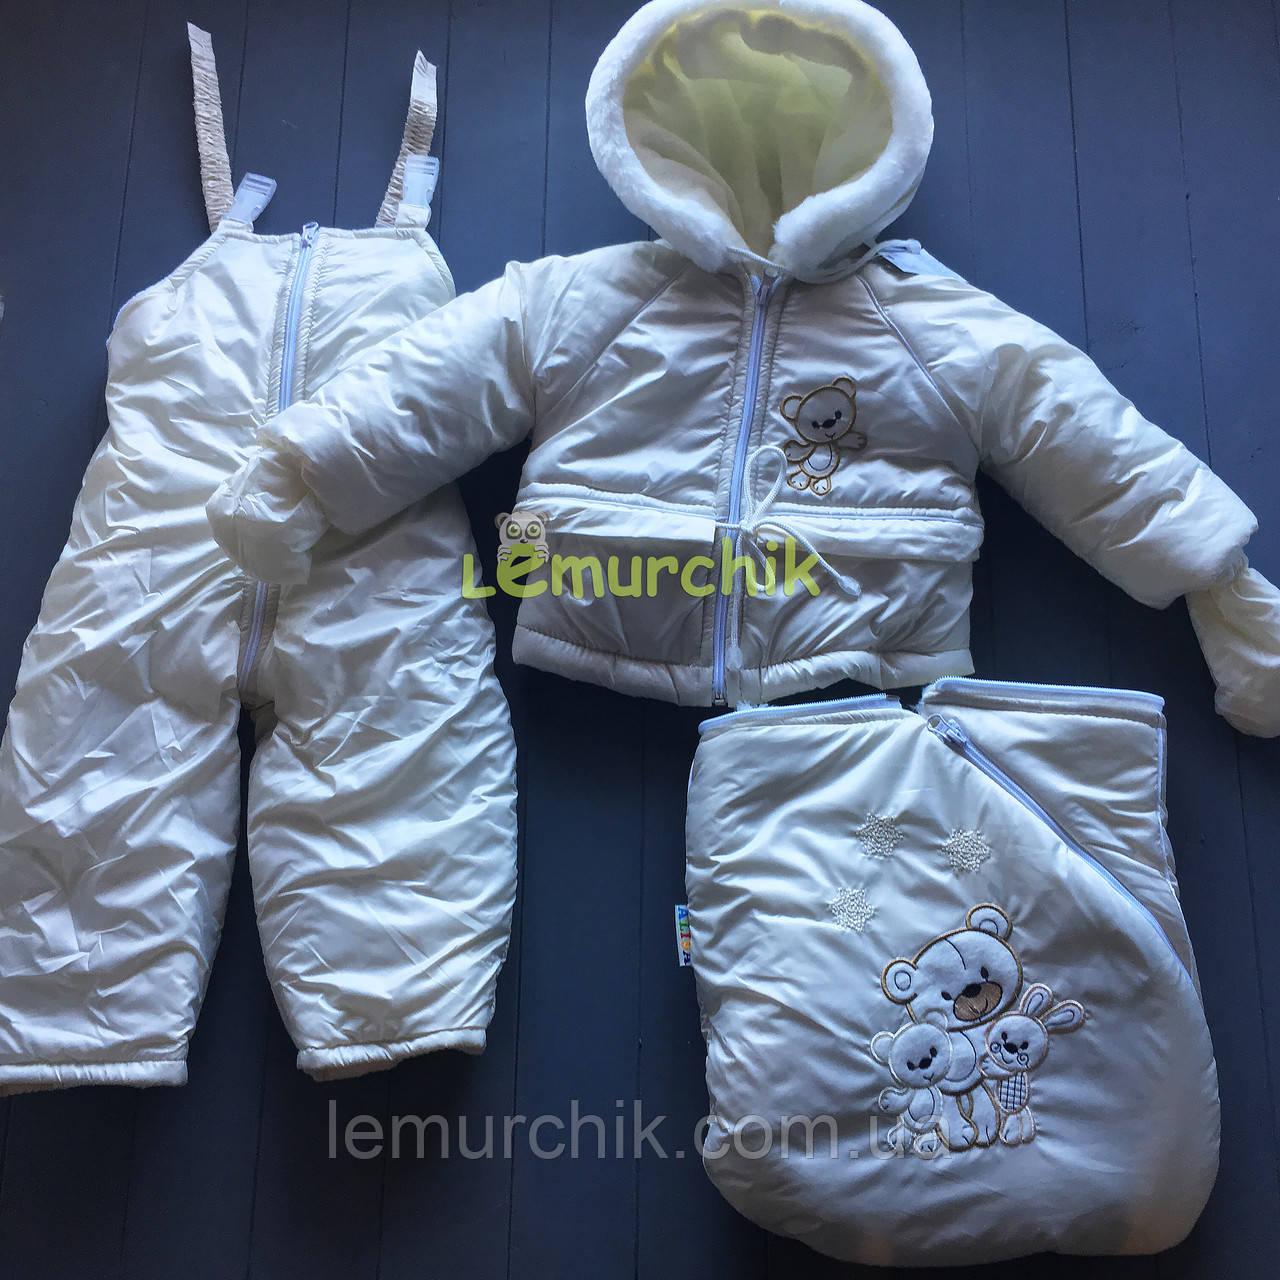 Детский зимний комбинезон-трансформер (куртка+штаны комбинезон+мешочек), молочный